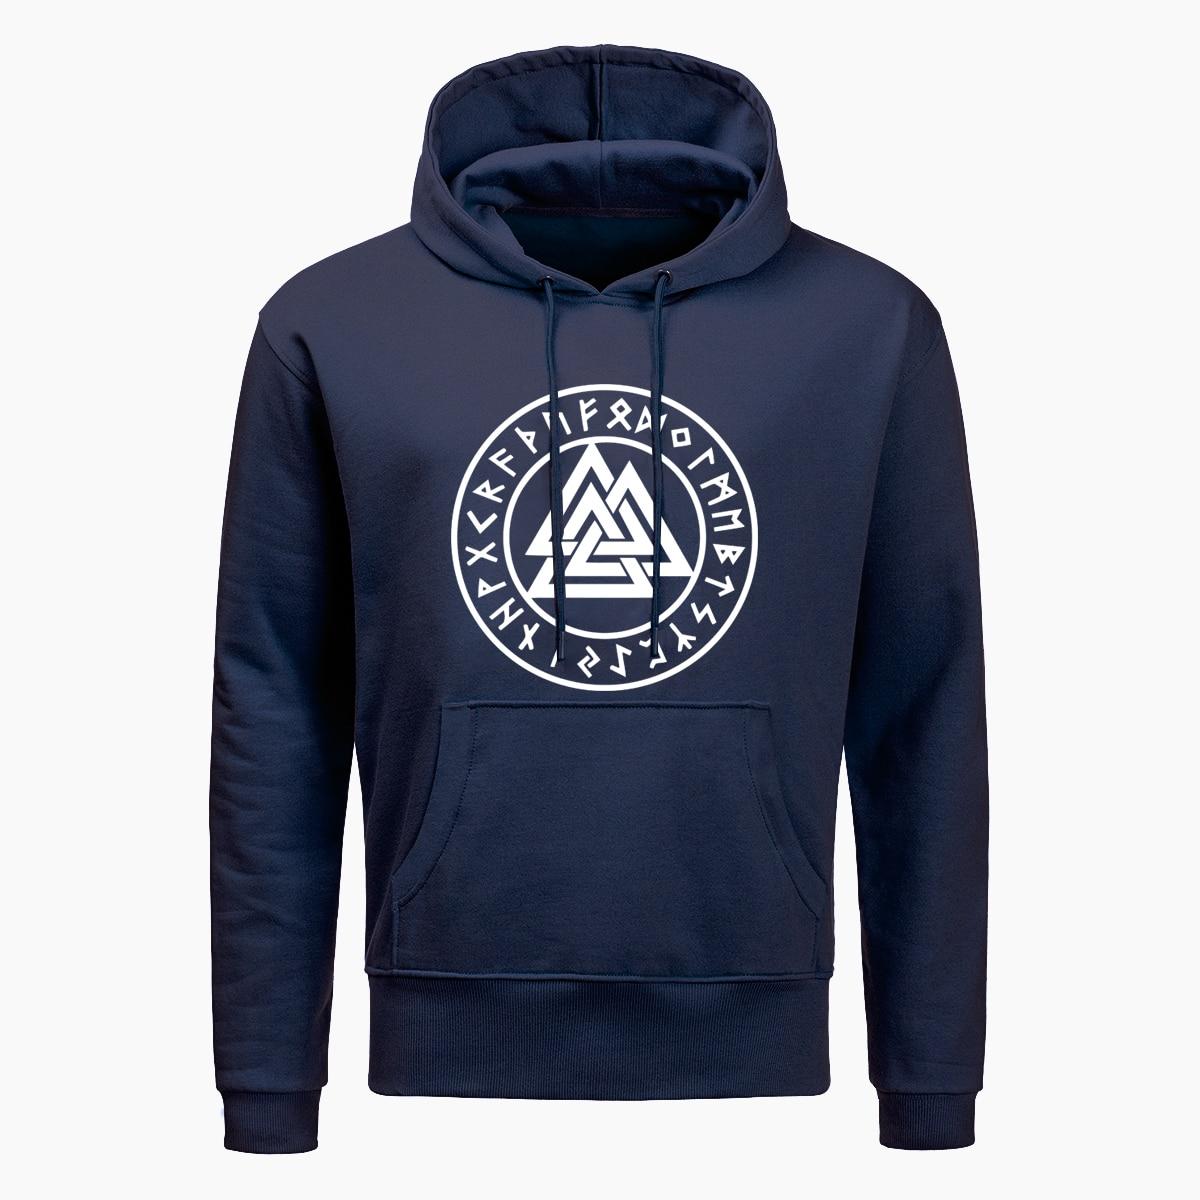 Cool Odin Viking Hoodies Men Vikings Symbols Print Hoodie Men Autumn Hip Hop Tops Winter Harajuku Streetwear